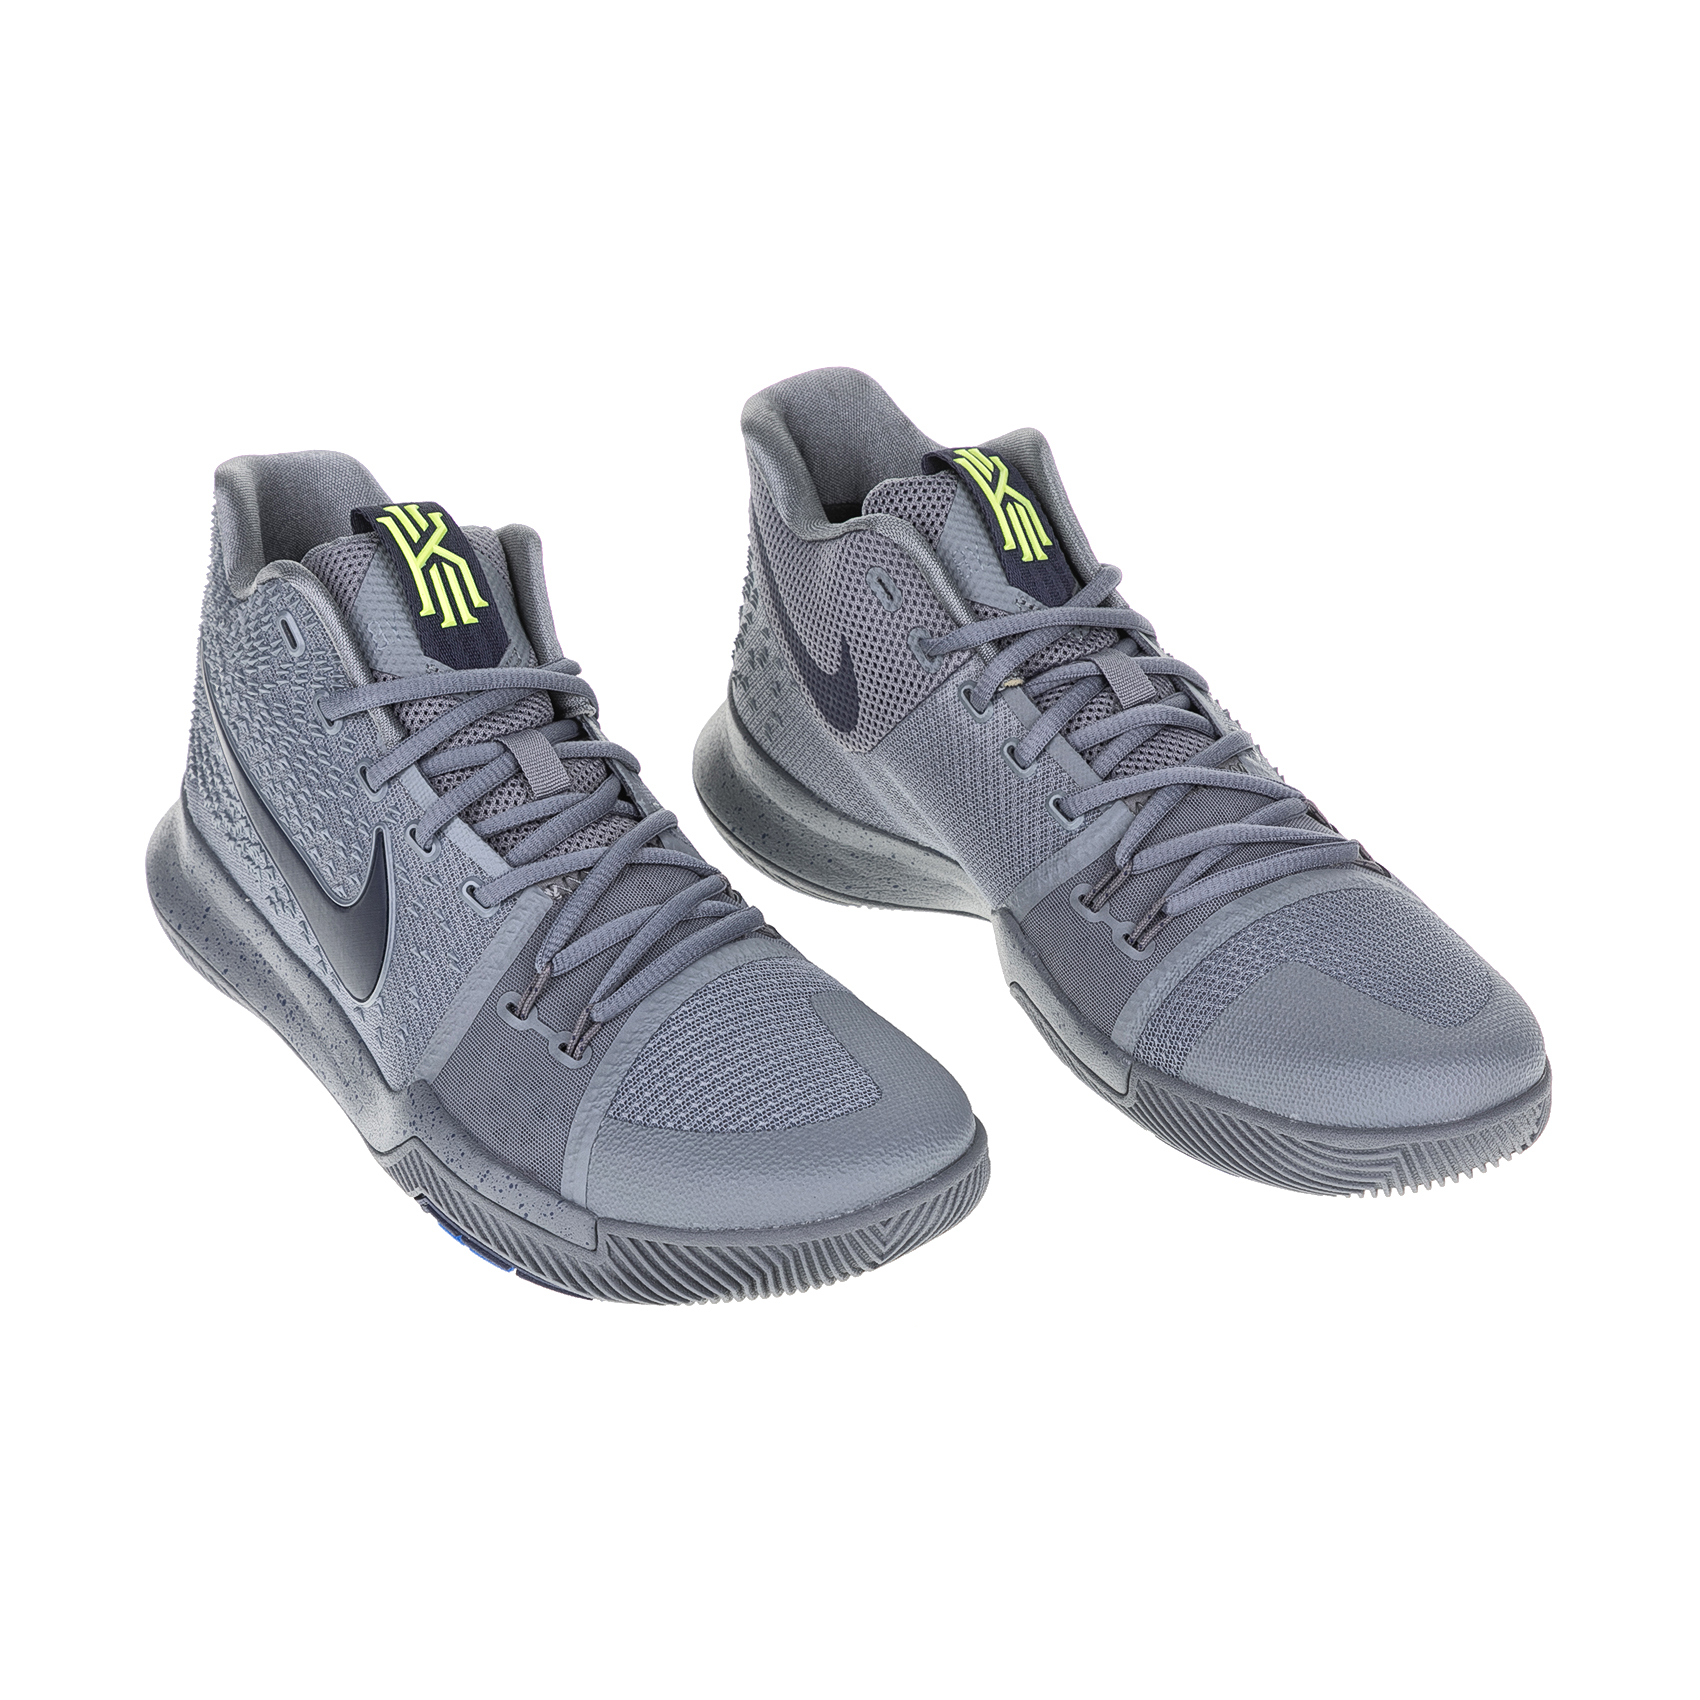 NIKE – Ανδρικά παπούτσια μπάσκετ ΝΙΚΕ KYRIE 3 γκρι